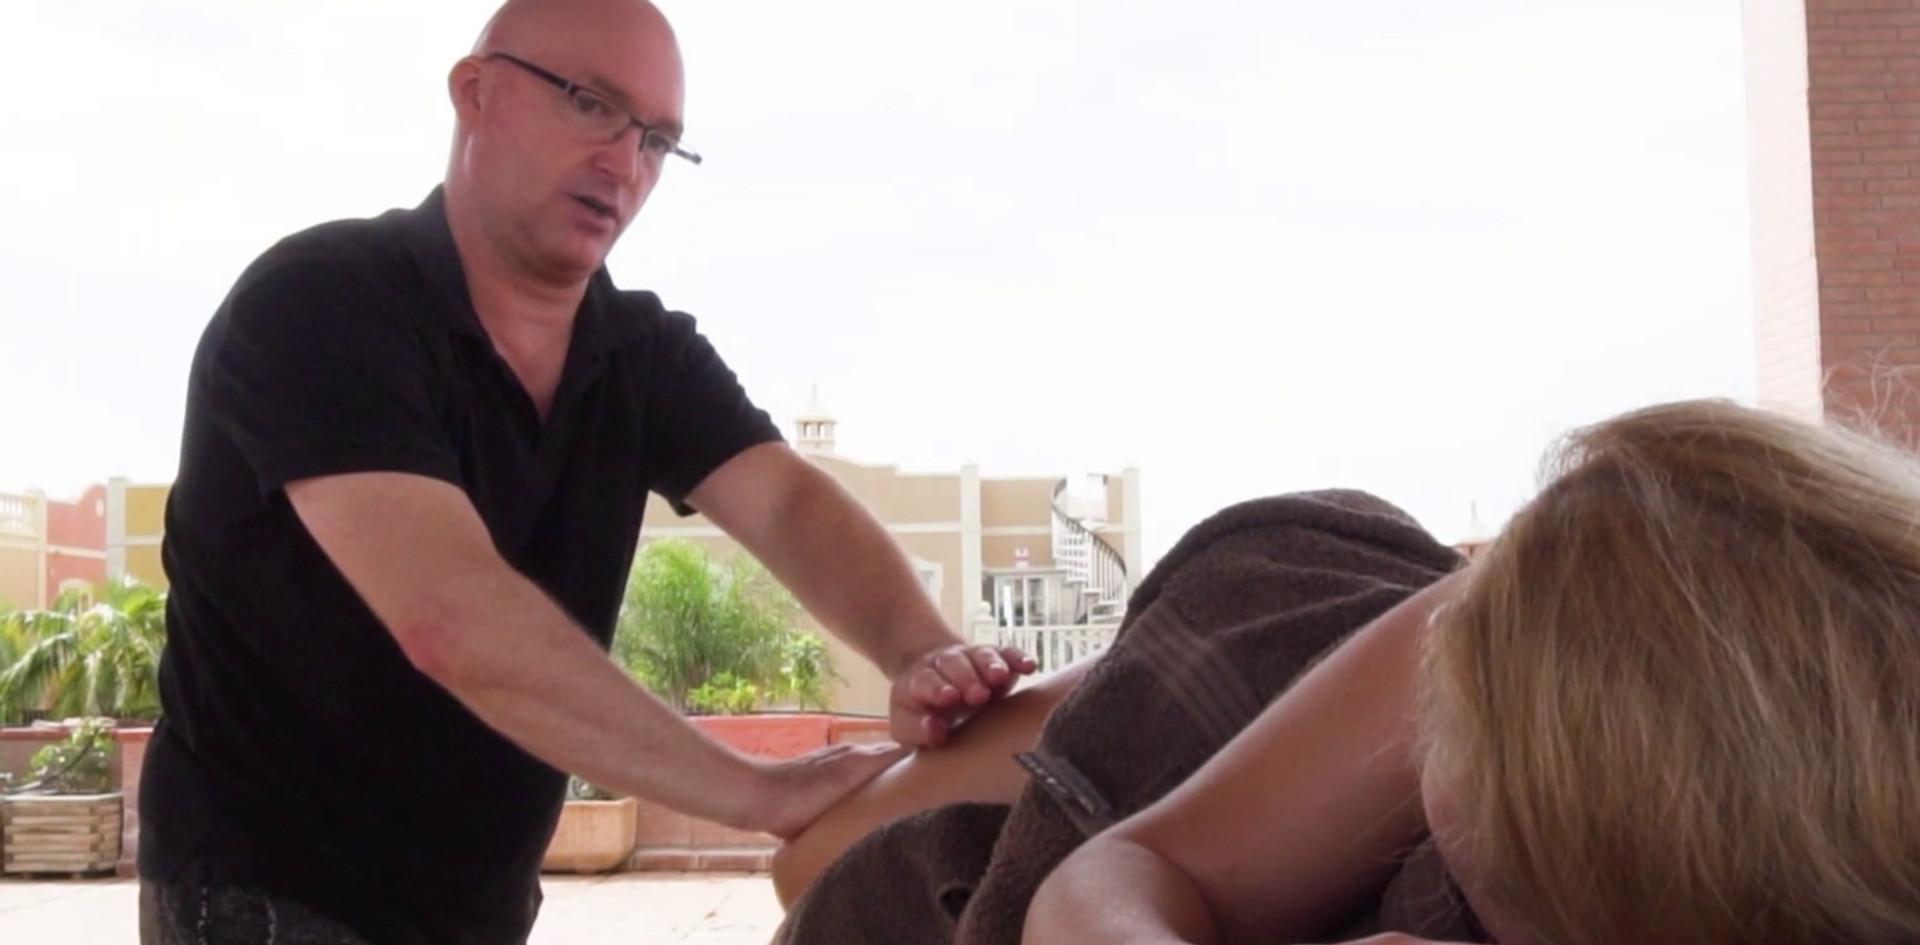 Massage Courses Europe - Corrective Exercise & Massage Therapies